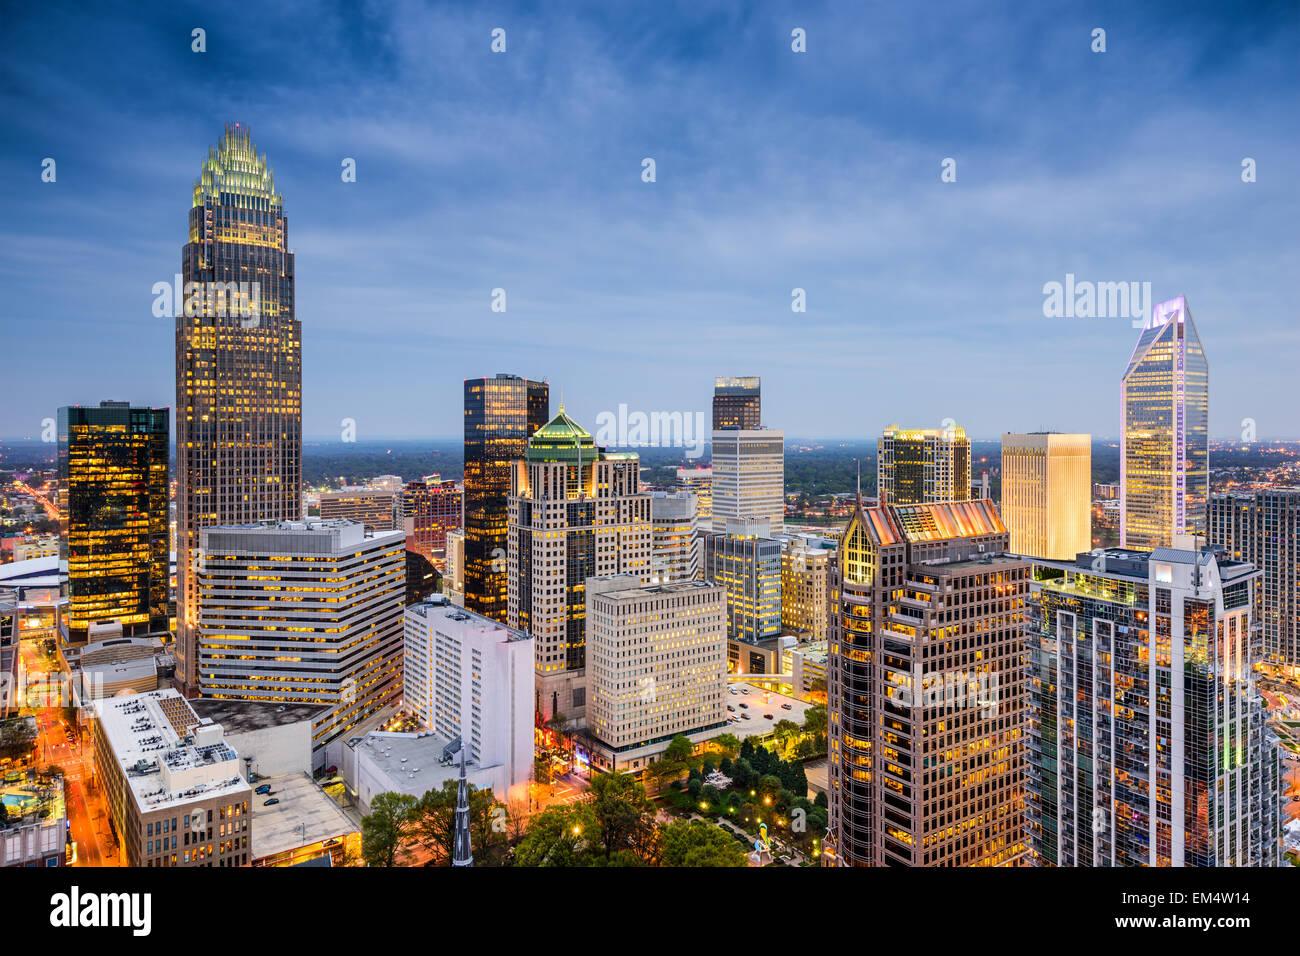 Charlotte, North Carolina, Stati Uniti d'America uptown skyline. Immagini Stock